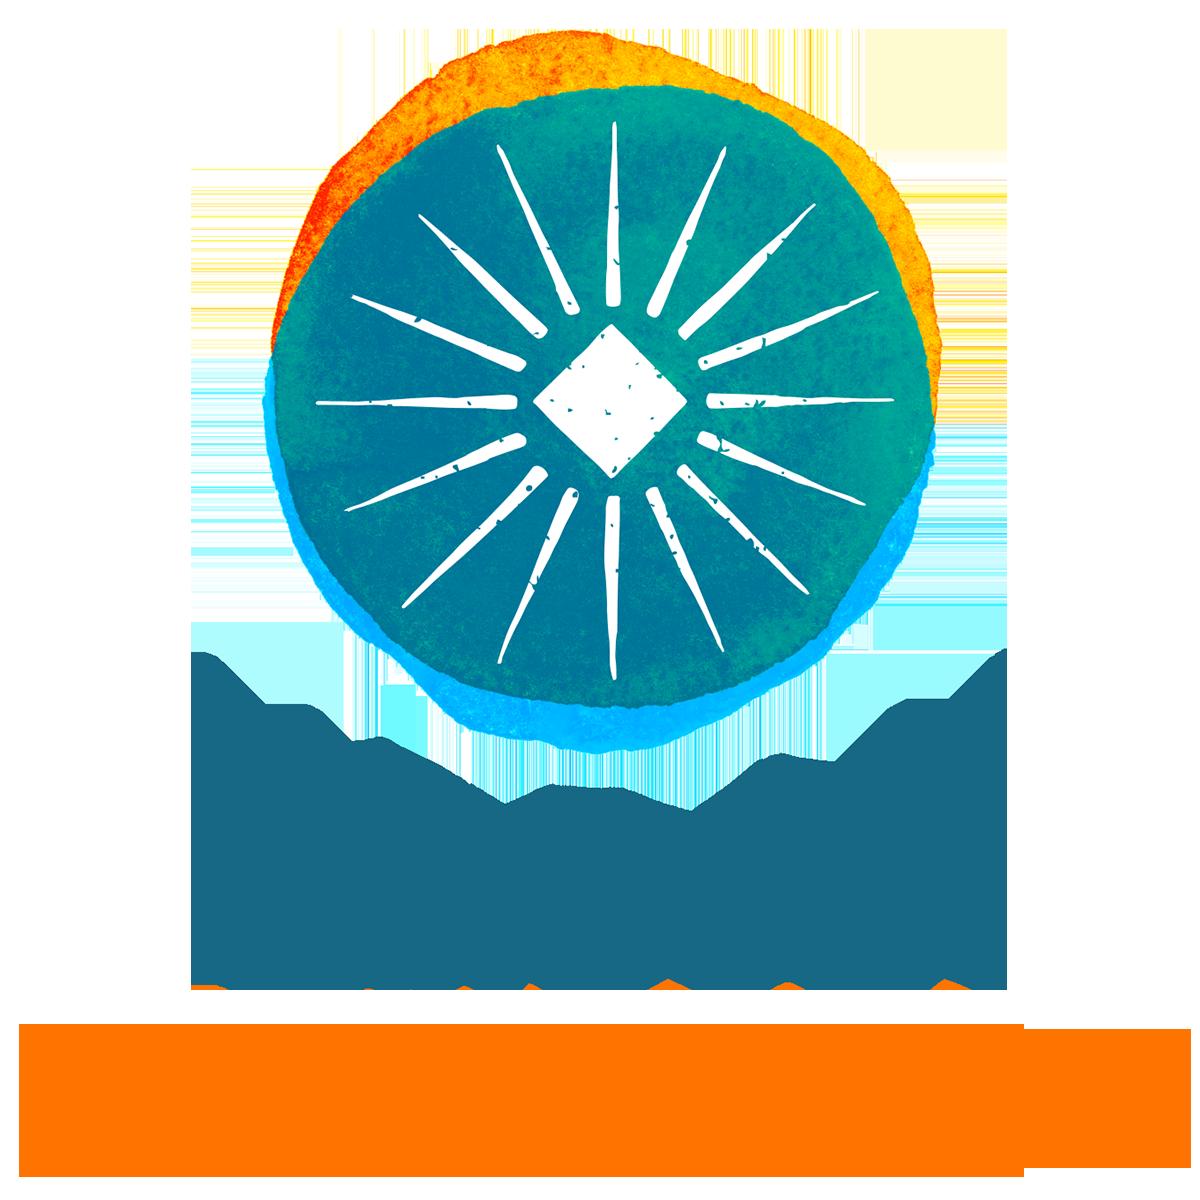 URBAN ARTIFACT - CINCINNATI, OH